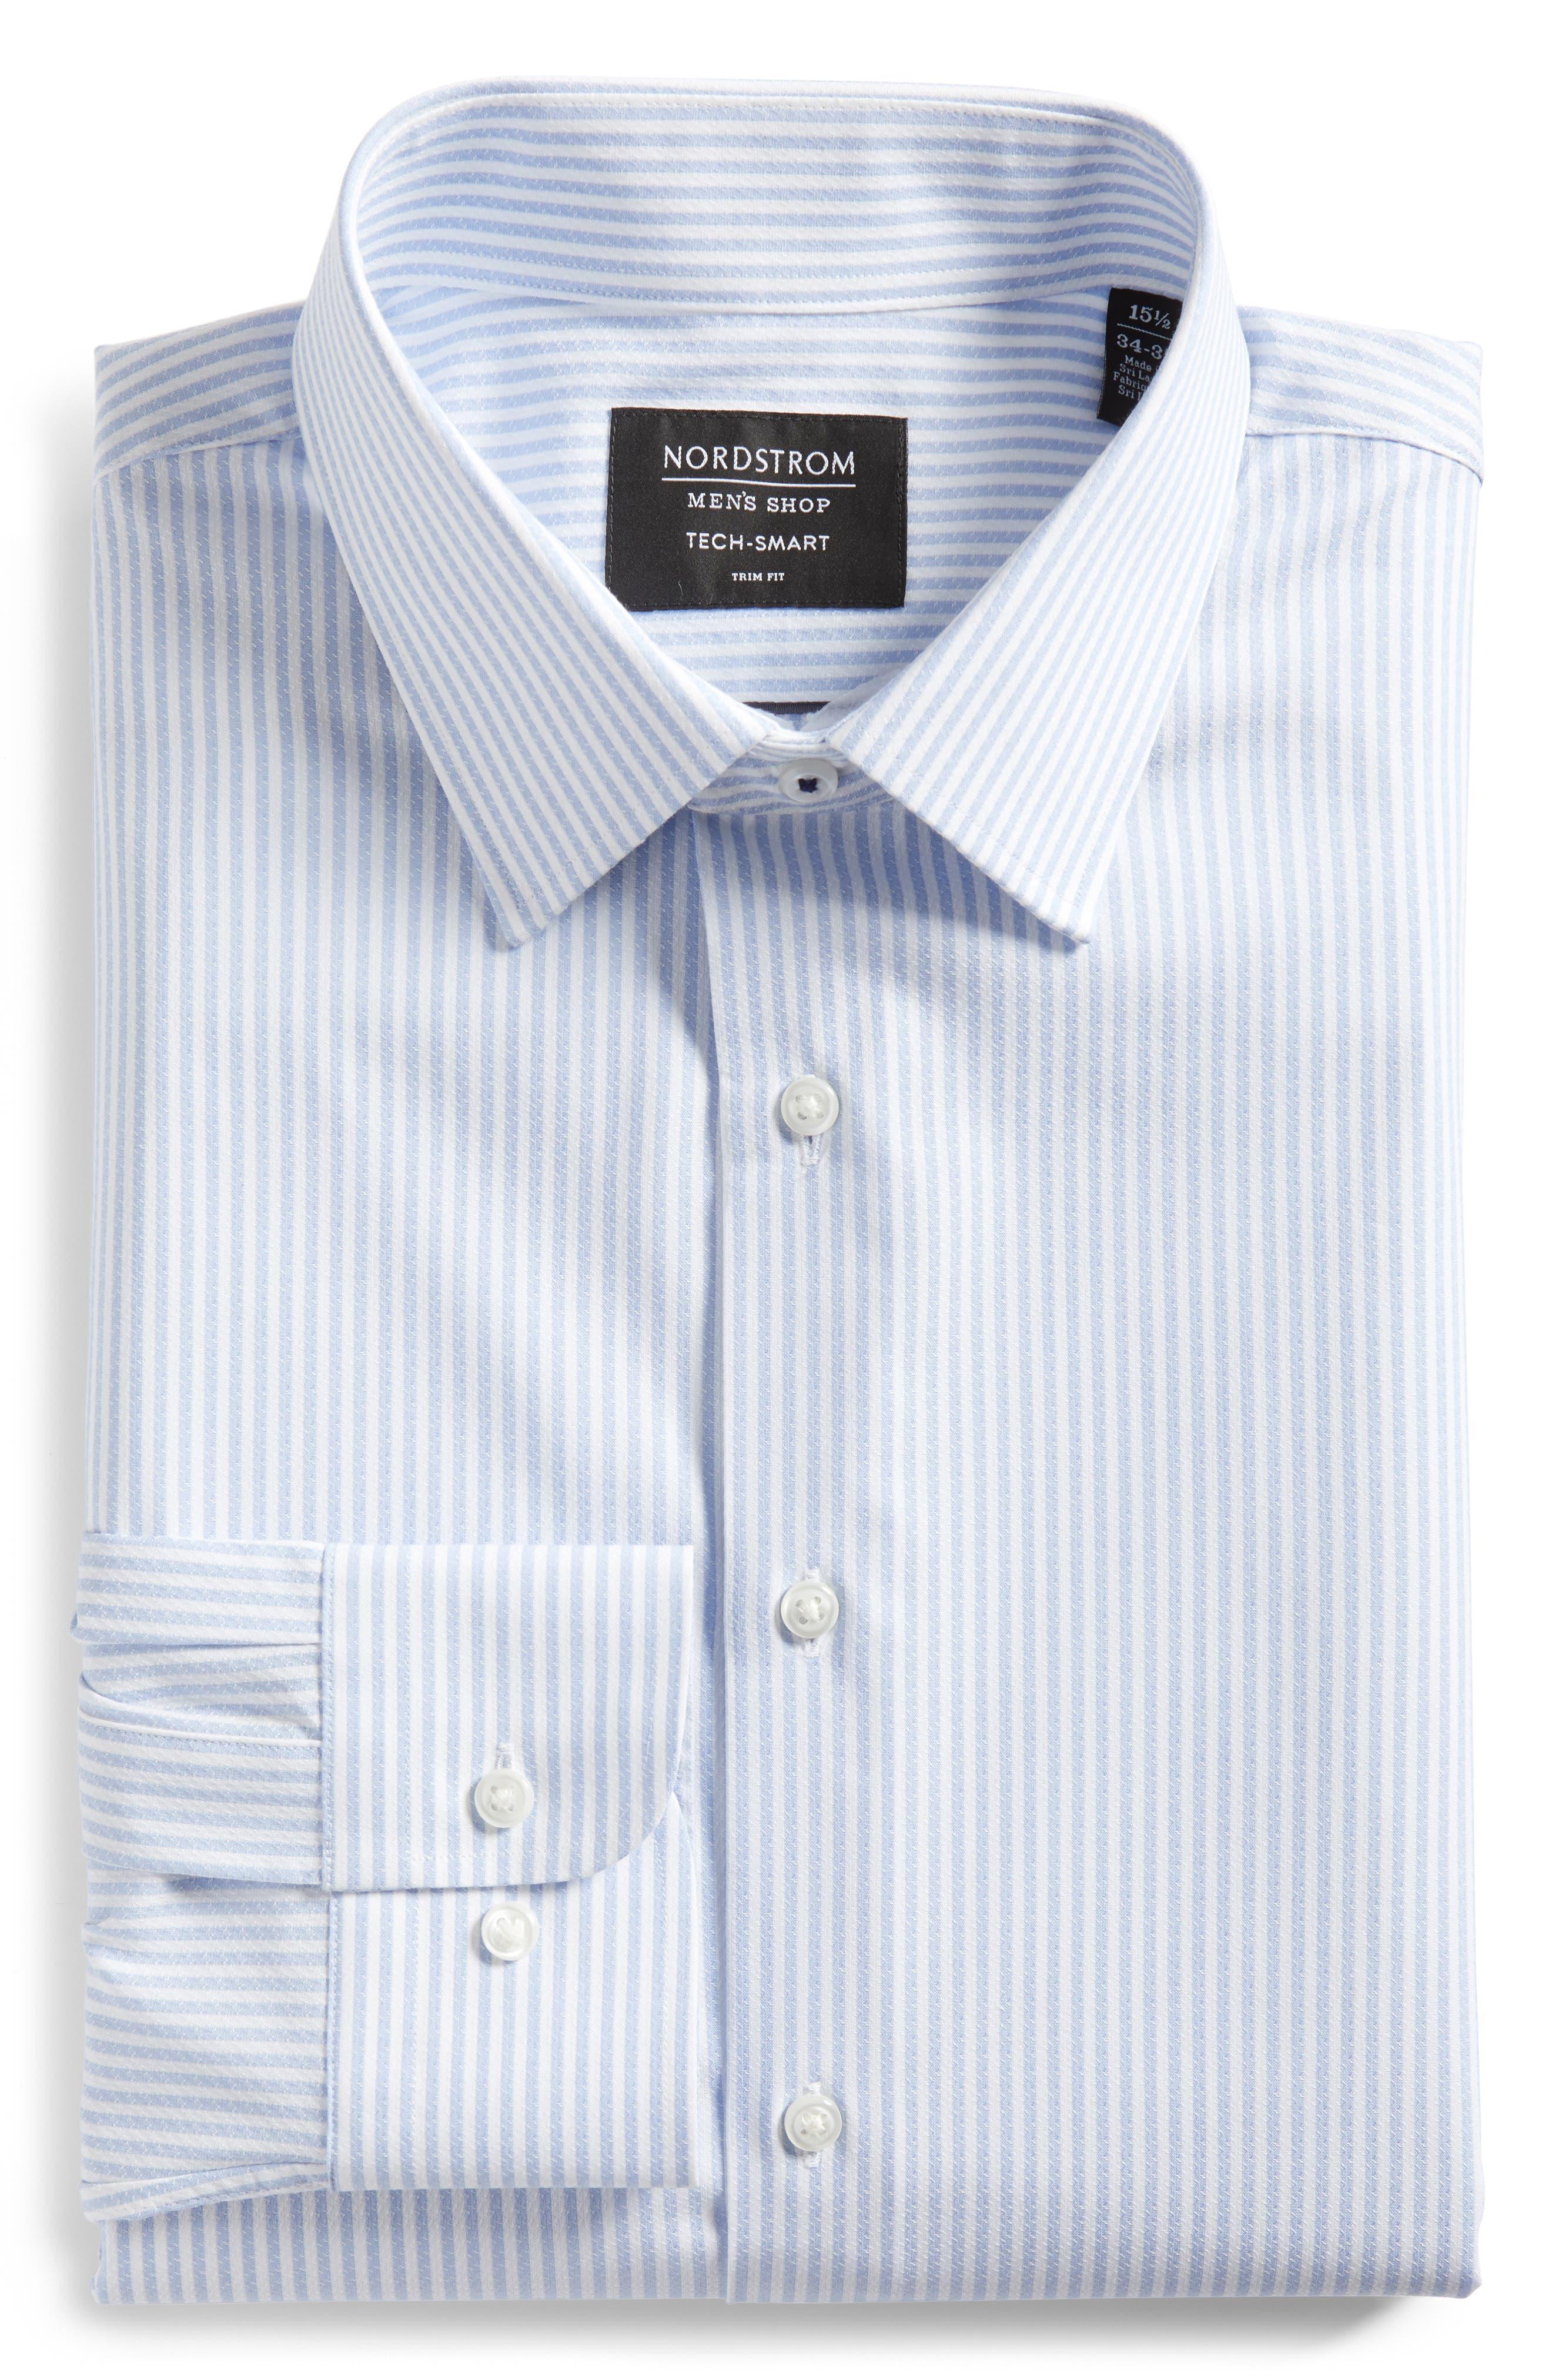 Tech-Smart Trim Fit Stripe Stretch Dress Shirt,                             Alternate thumbnail 6, color,                             Blue Brunnera